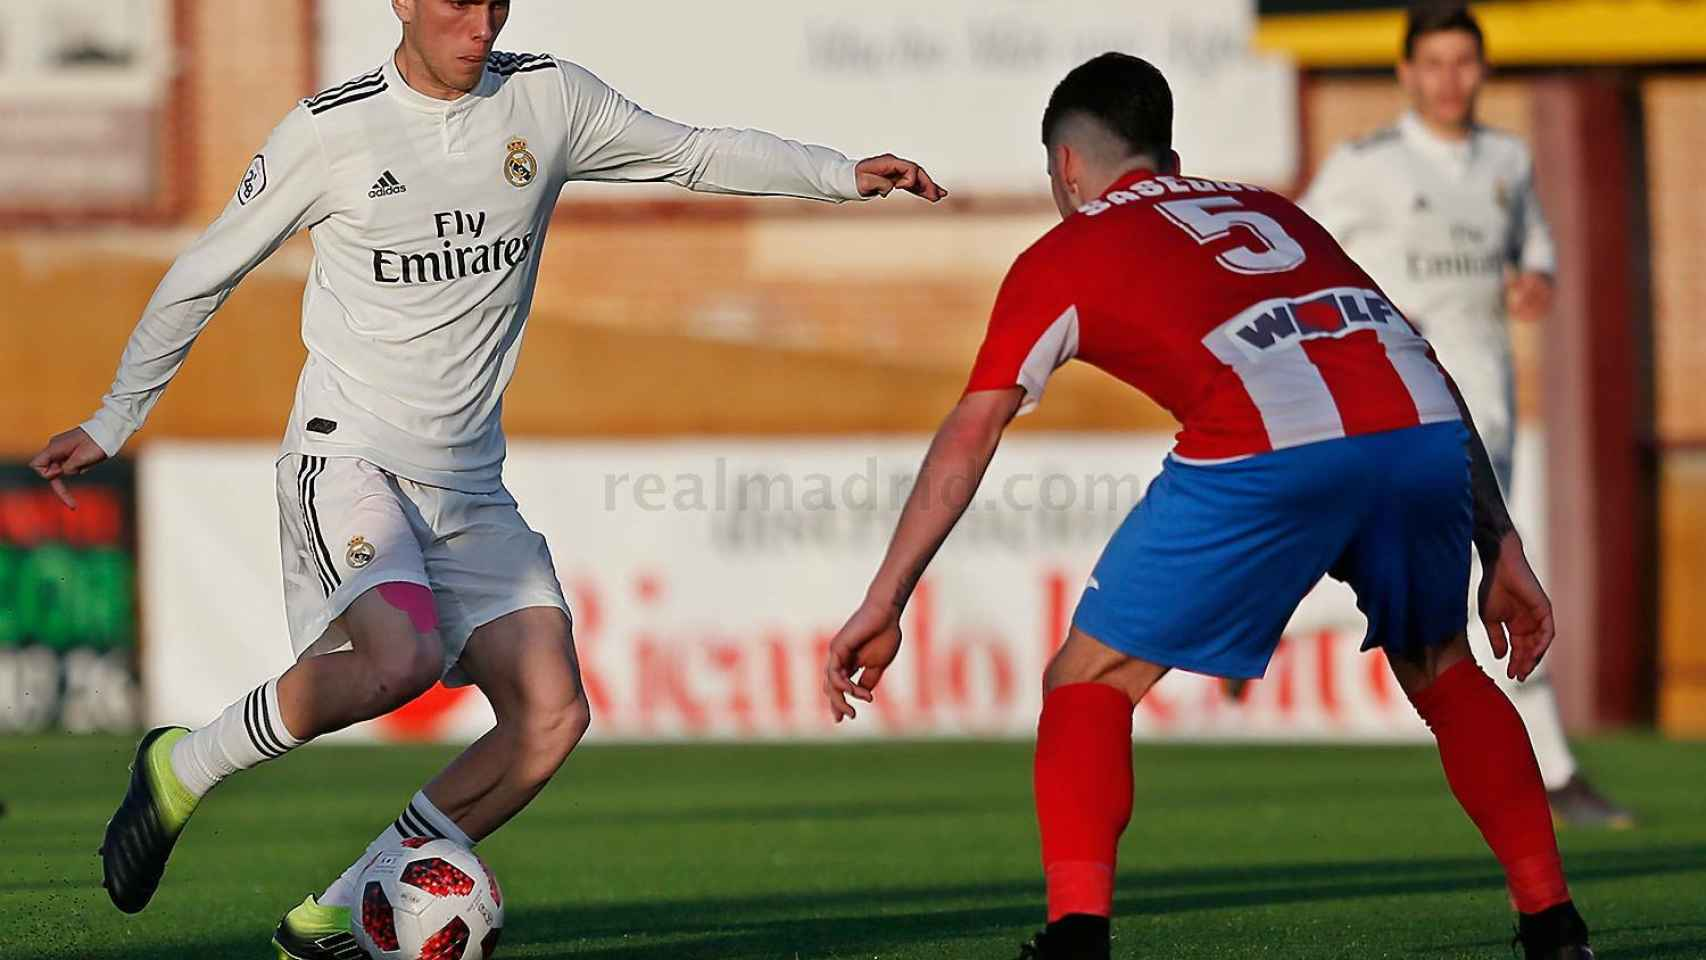 Sergio López intentando regatear a un rival